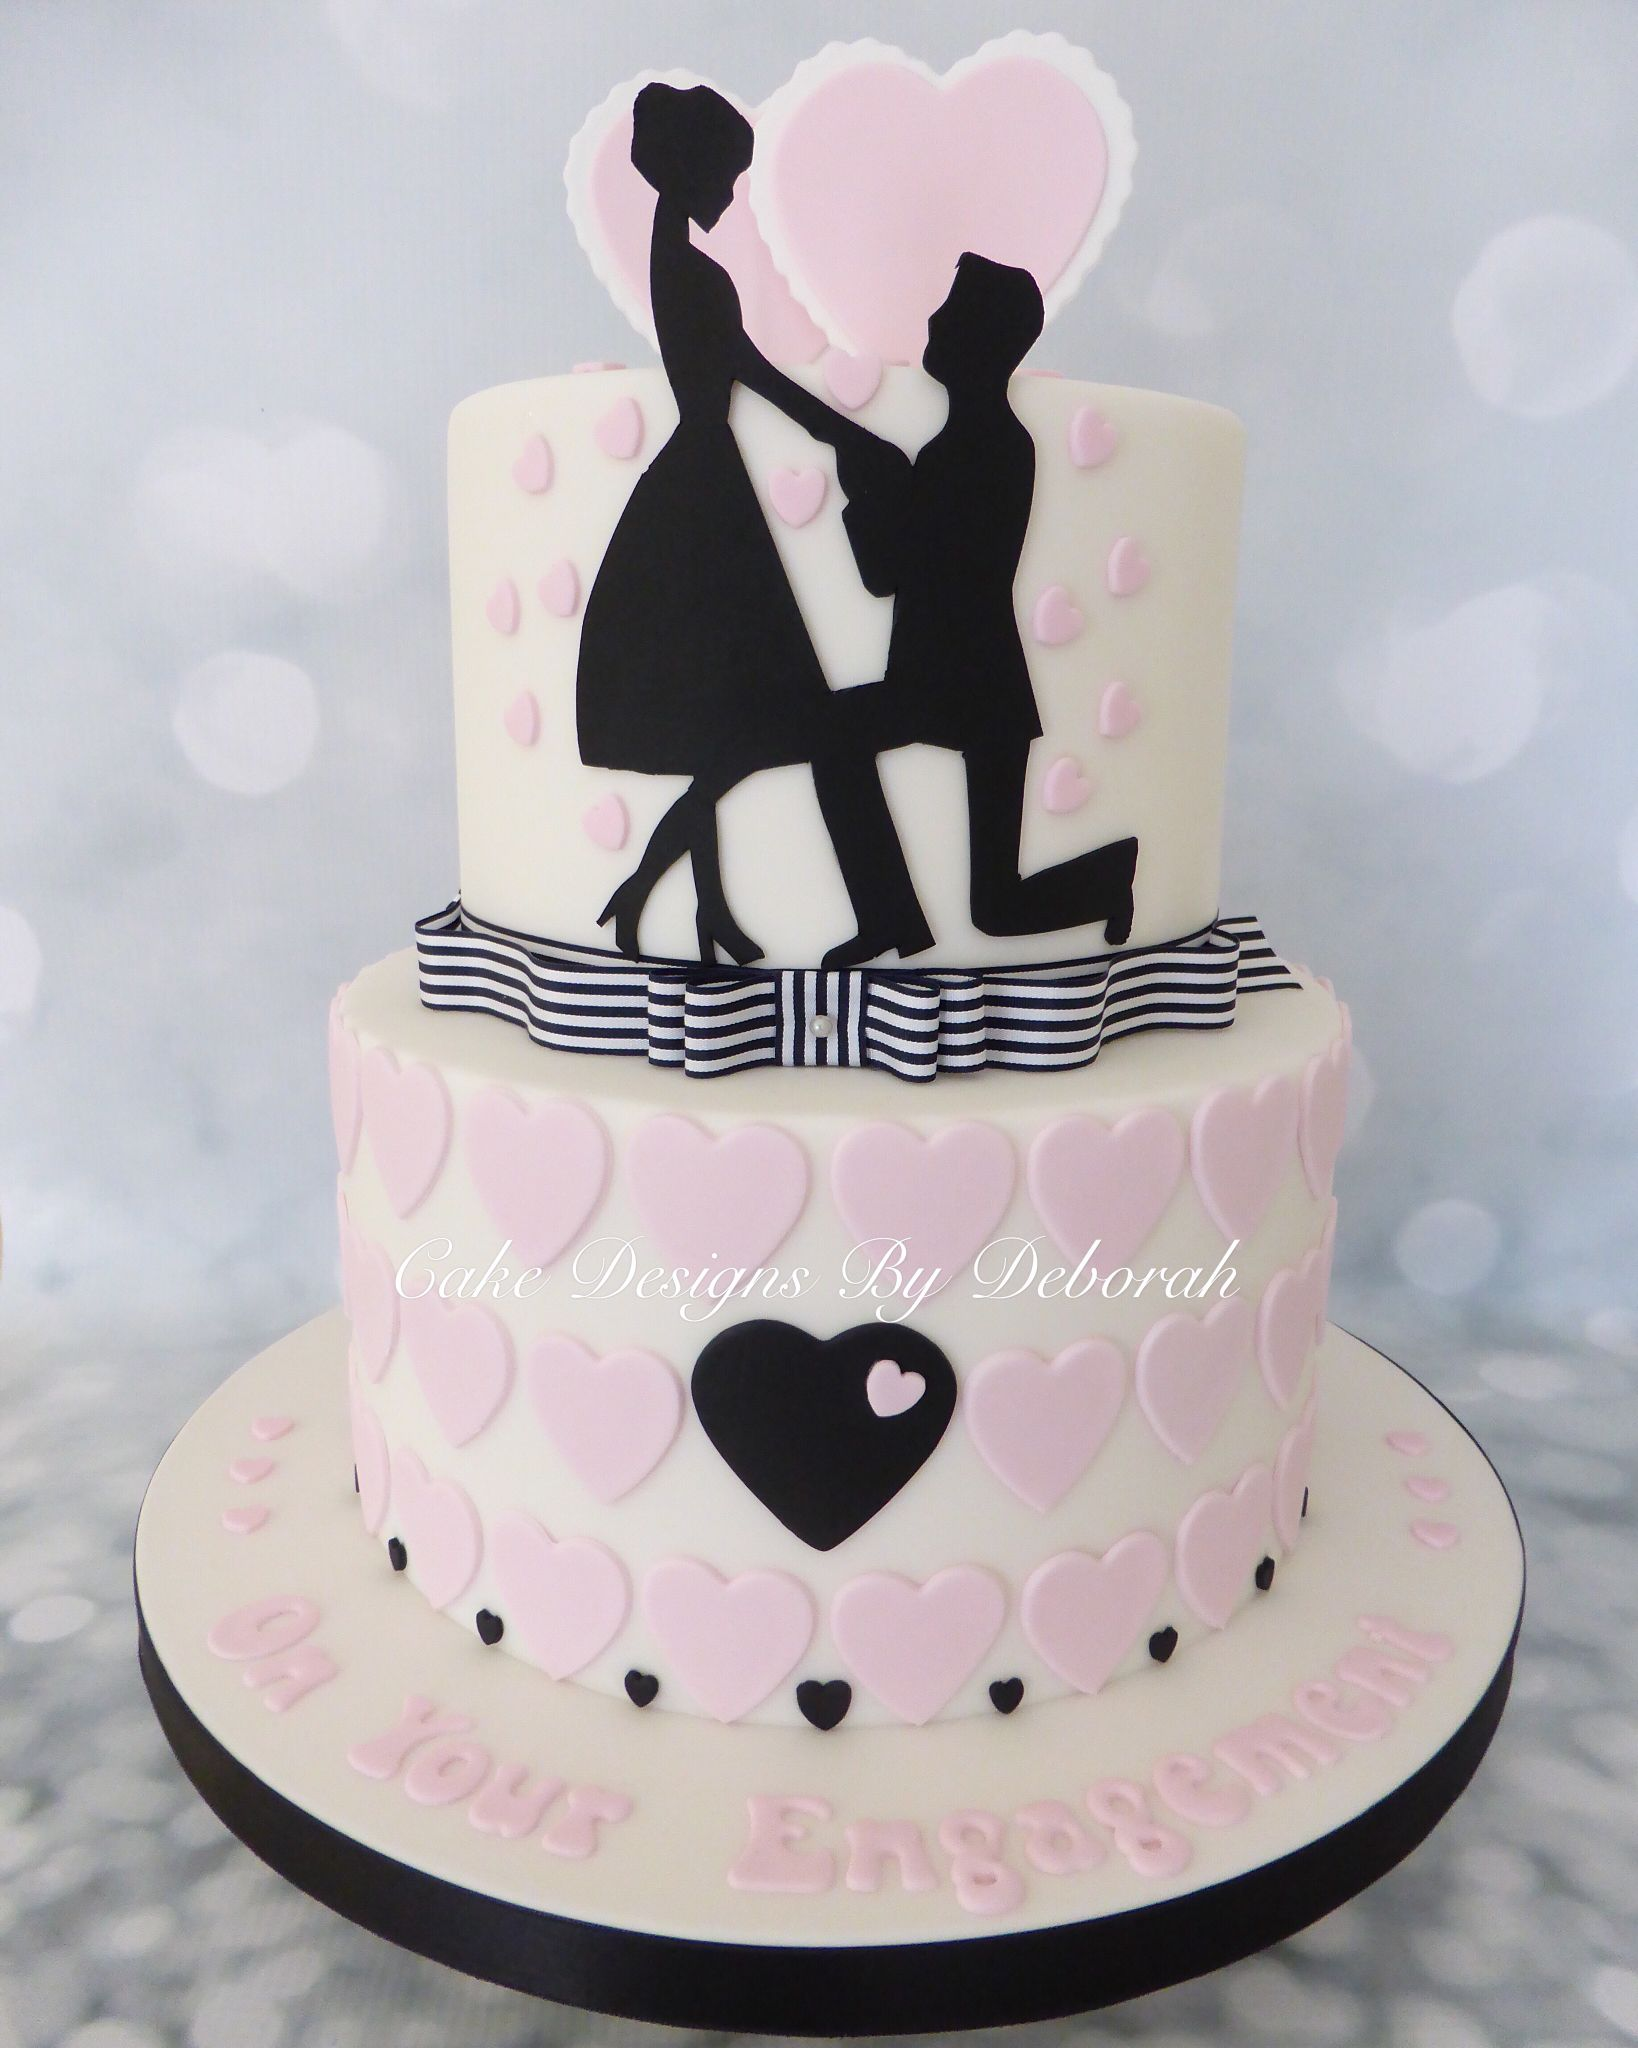 Cake Designs By Deborah : Silhouette Engagement Cake By : Cake Designs By Deborah ...